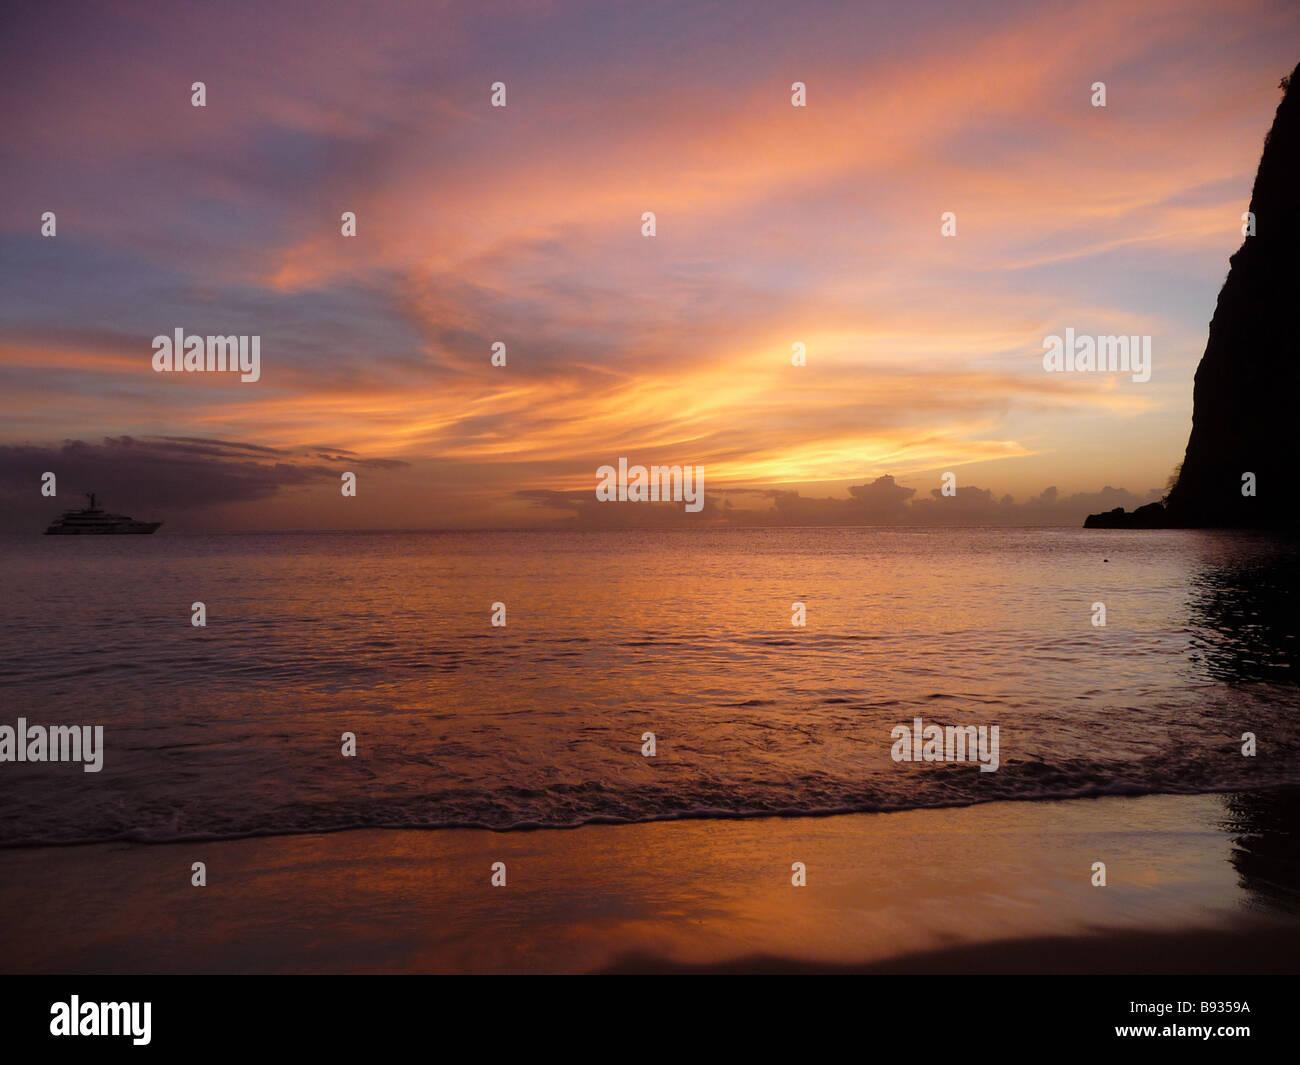 Sunset Anse Des Piton - Stock Image